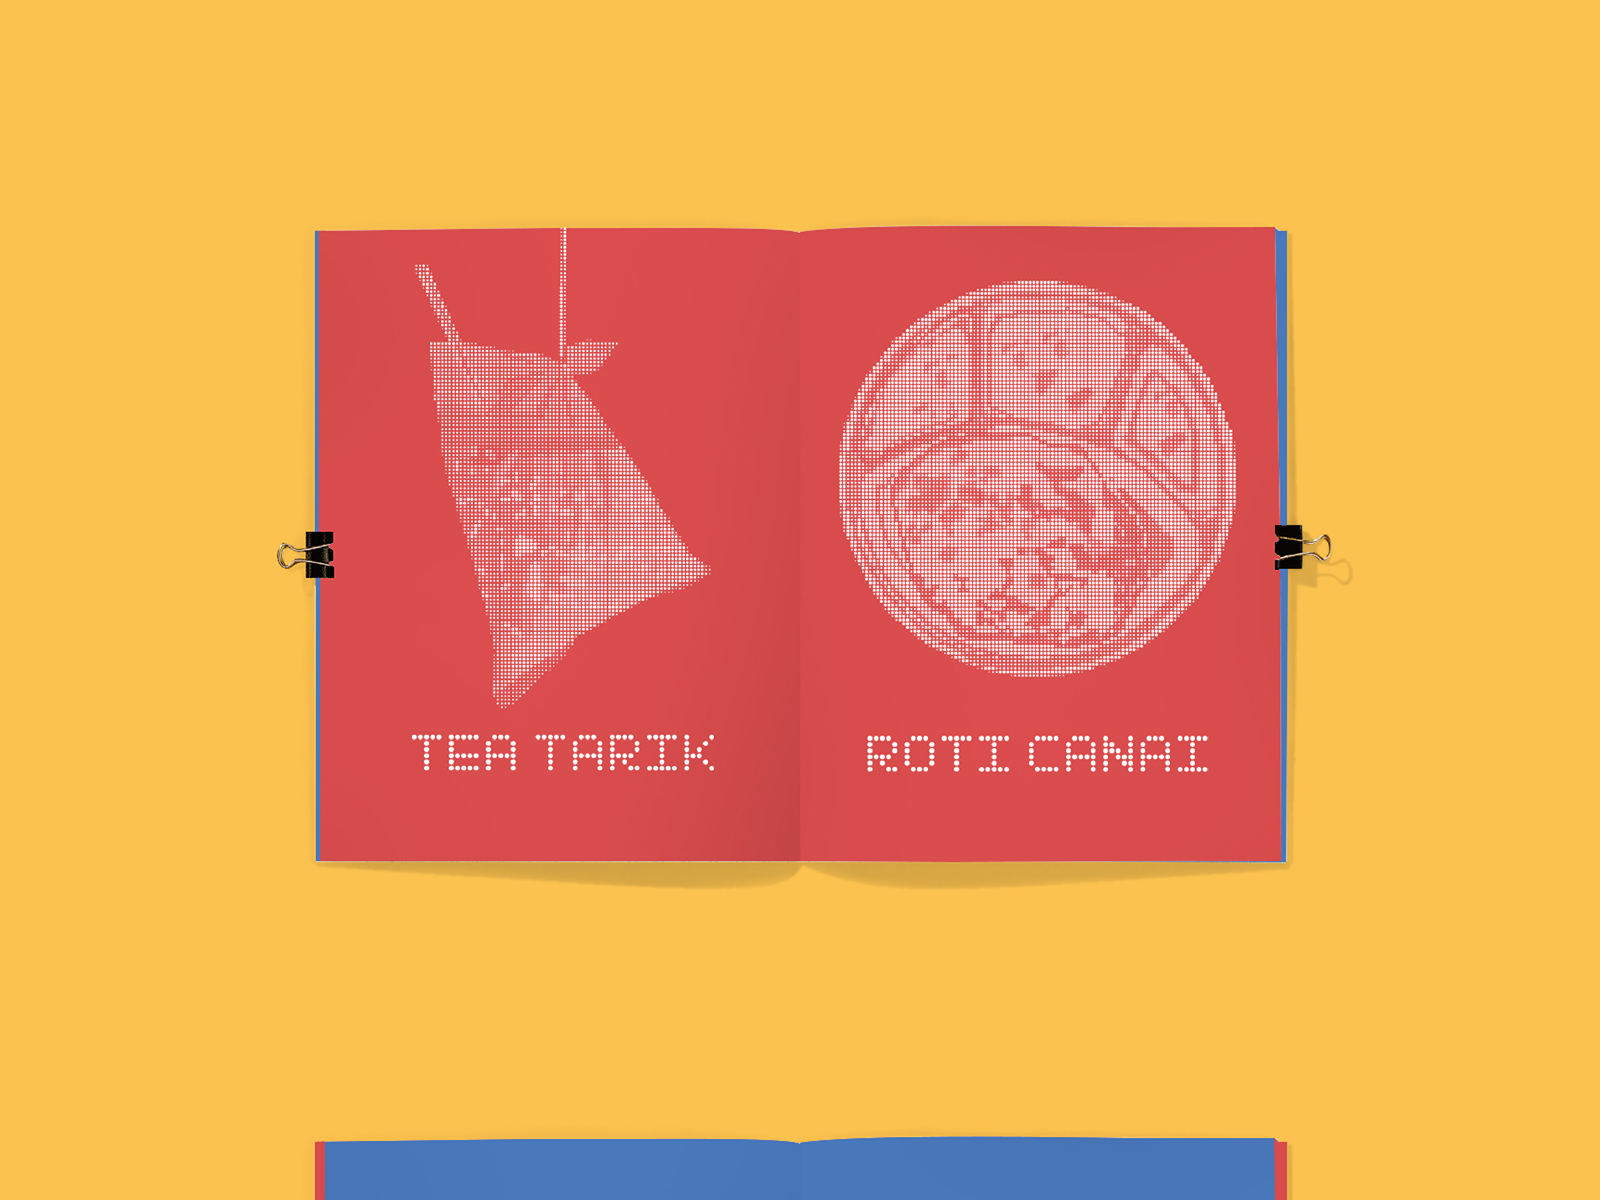 Grindz brand illustration used in social media management showing tea tarik and roti canai